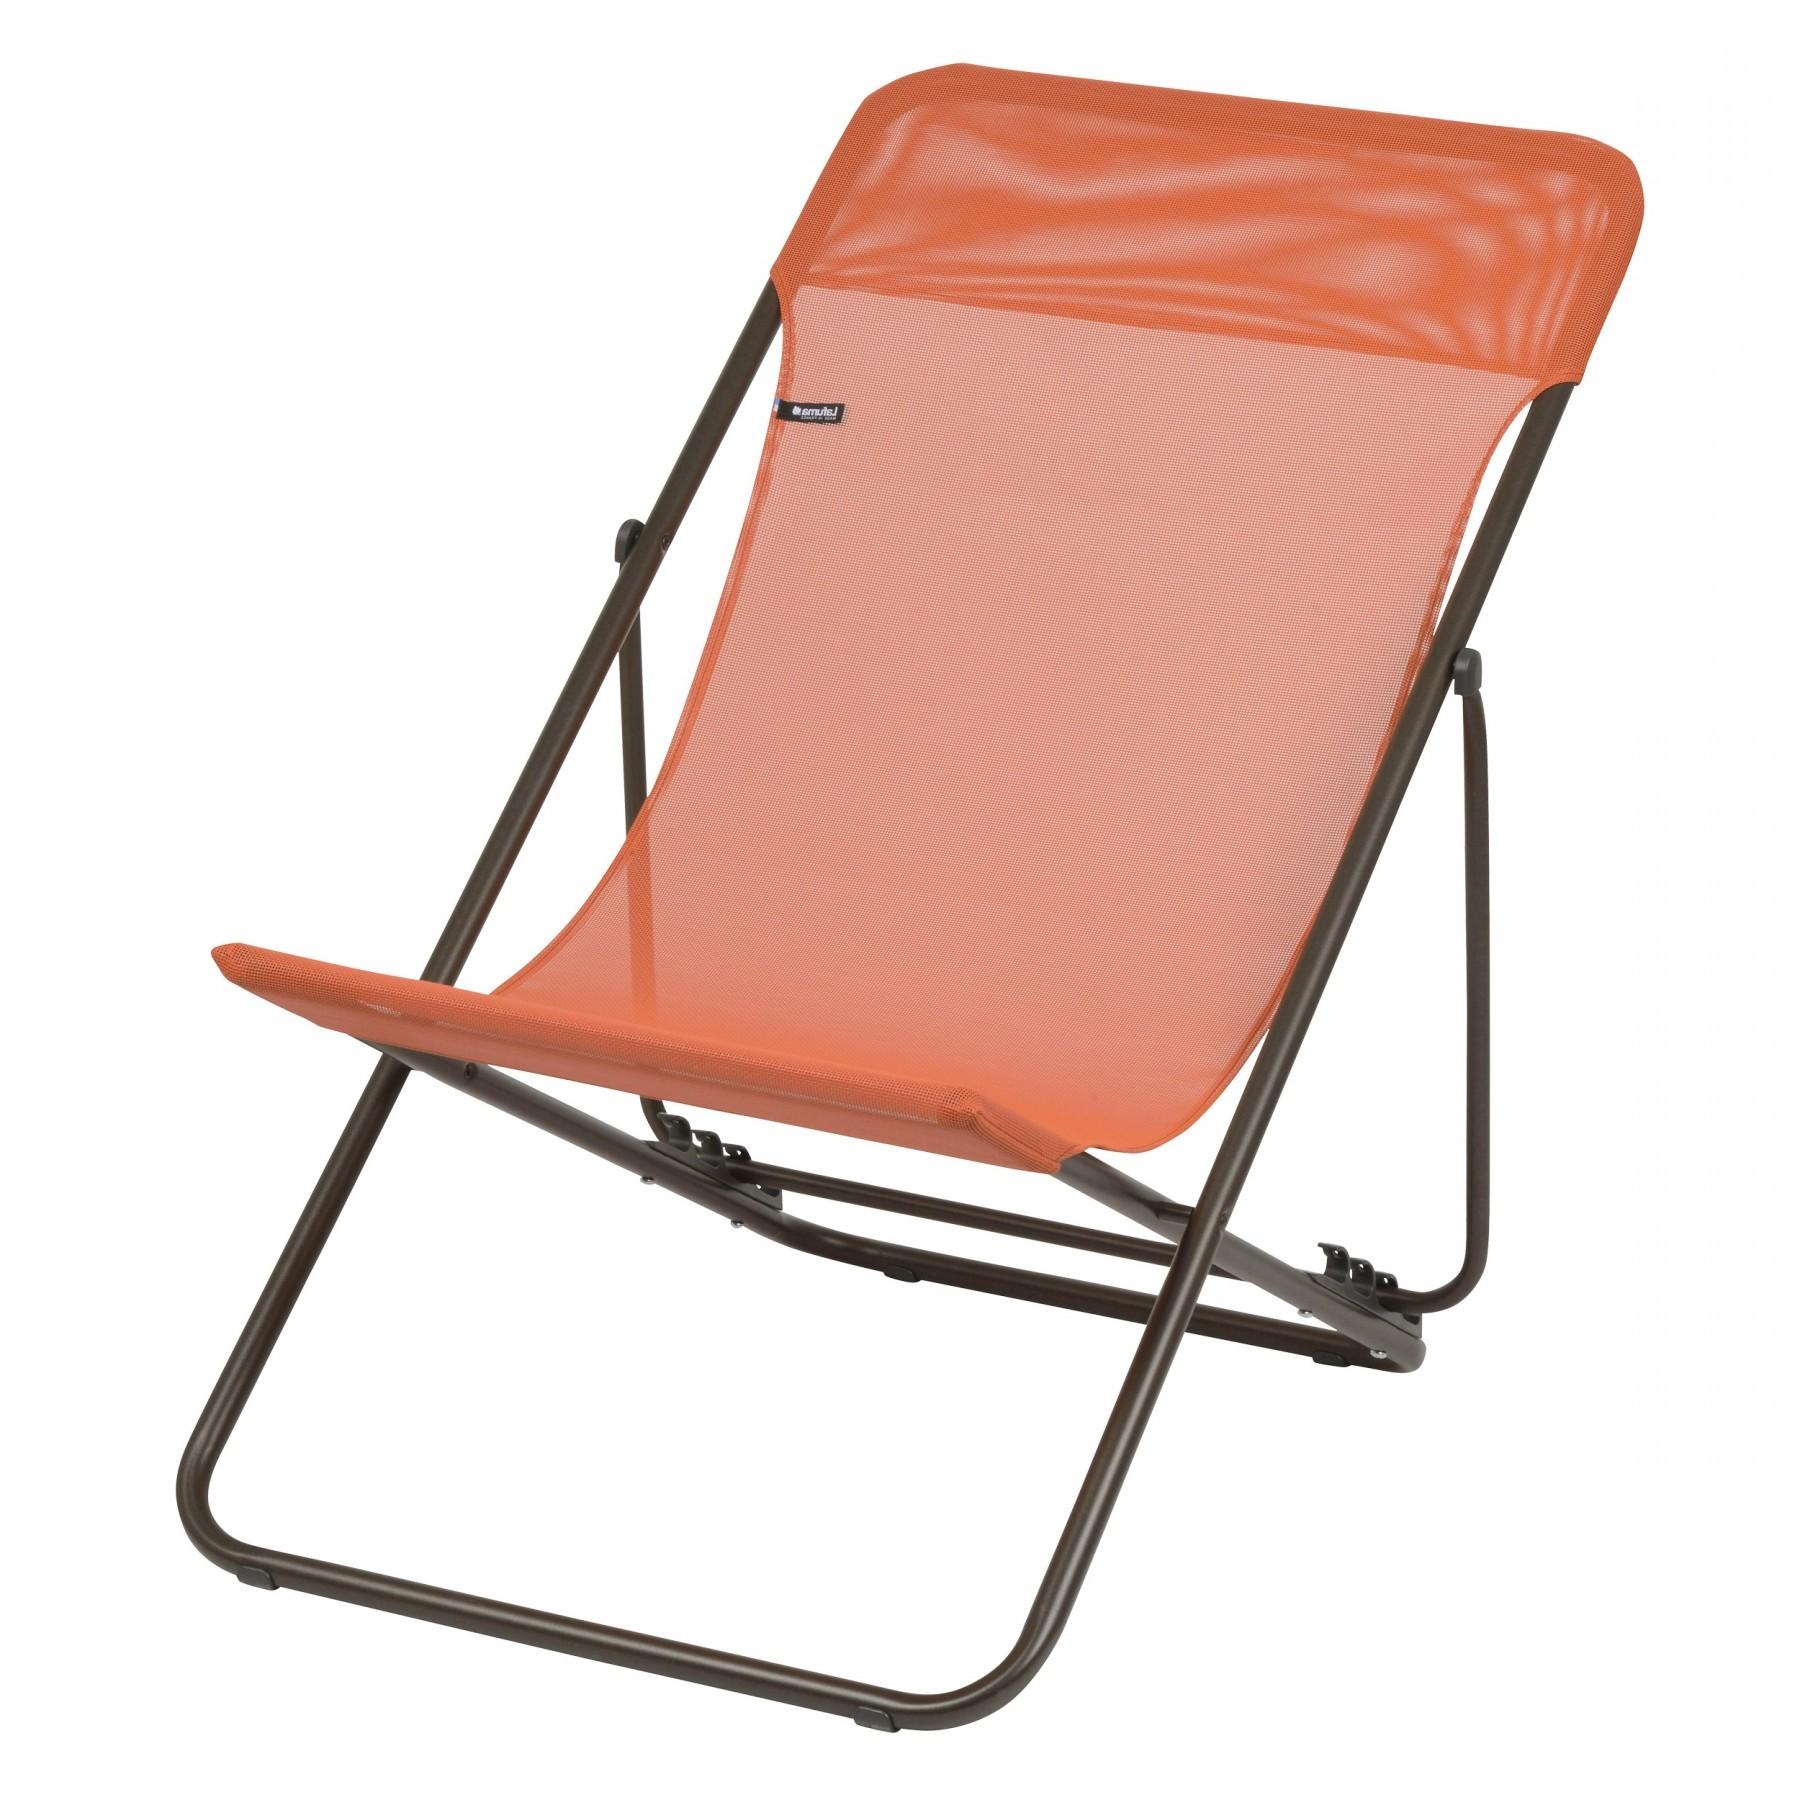 Soldes Chaise Longue Lafuma